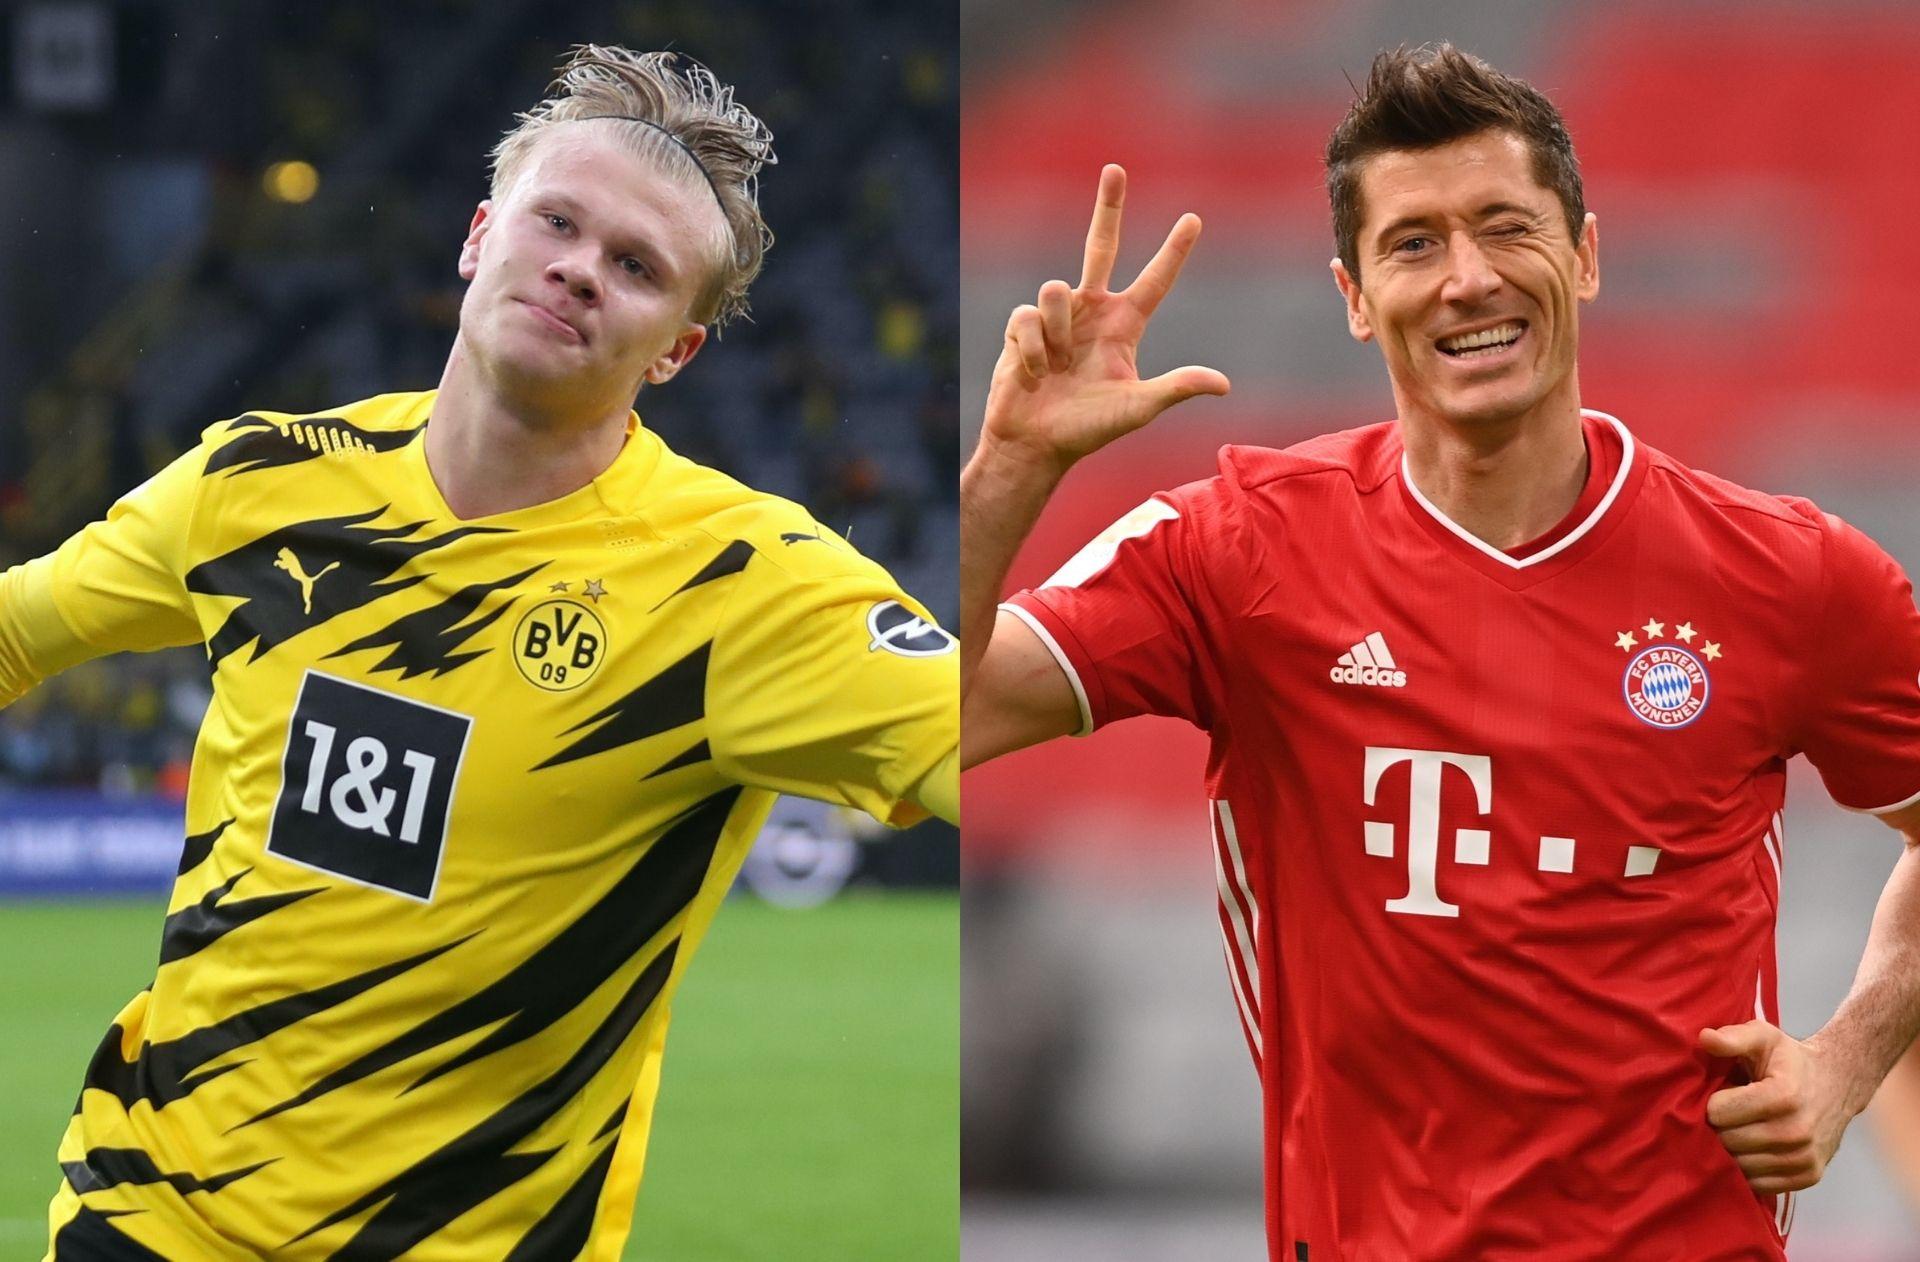 Dortmund vs Bayern Munich: Preview, Betting Tips, Stats & Prediction